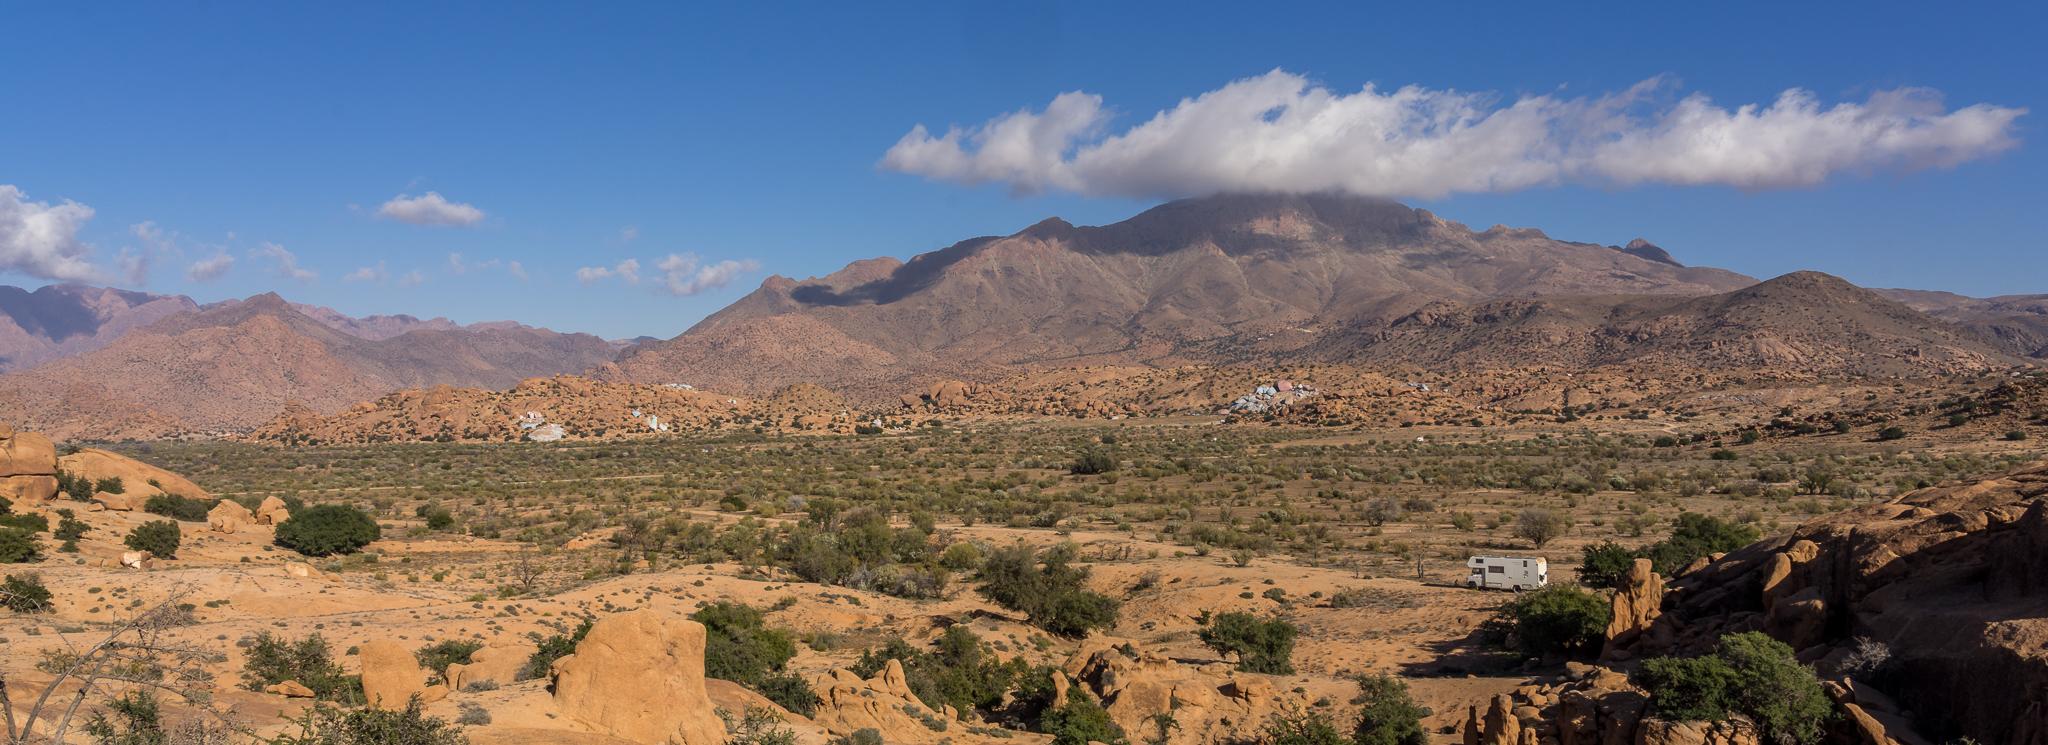 Marokk VII: nach Trafraoute und Sidi Ifni